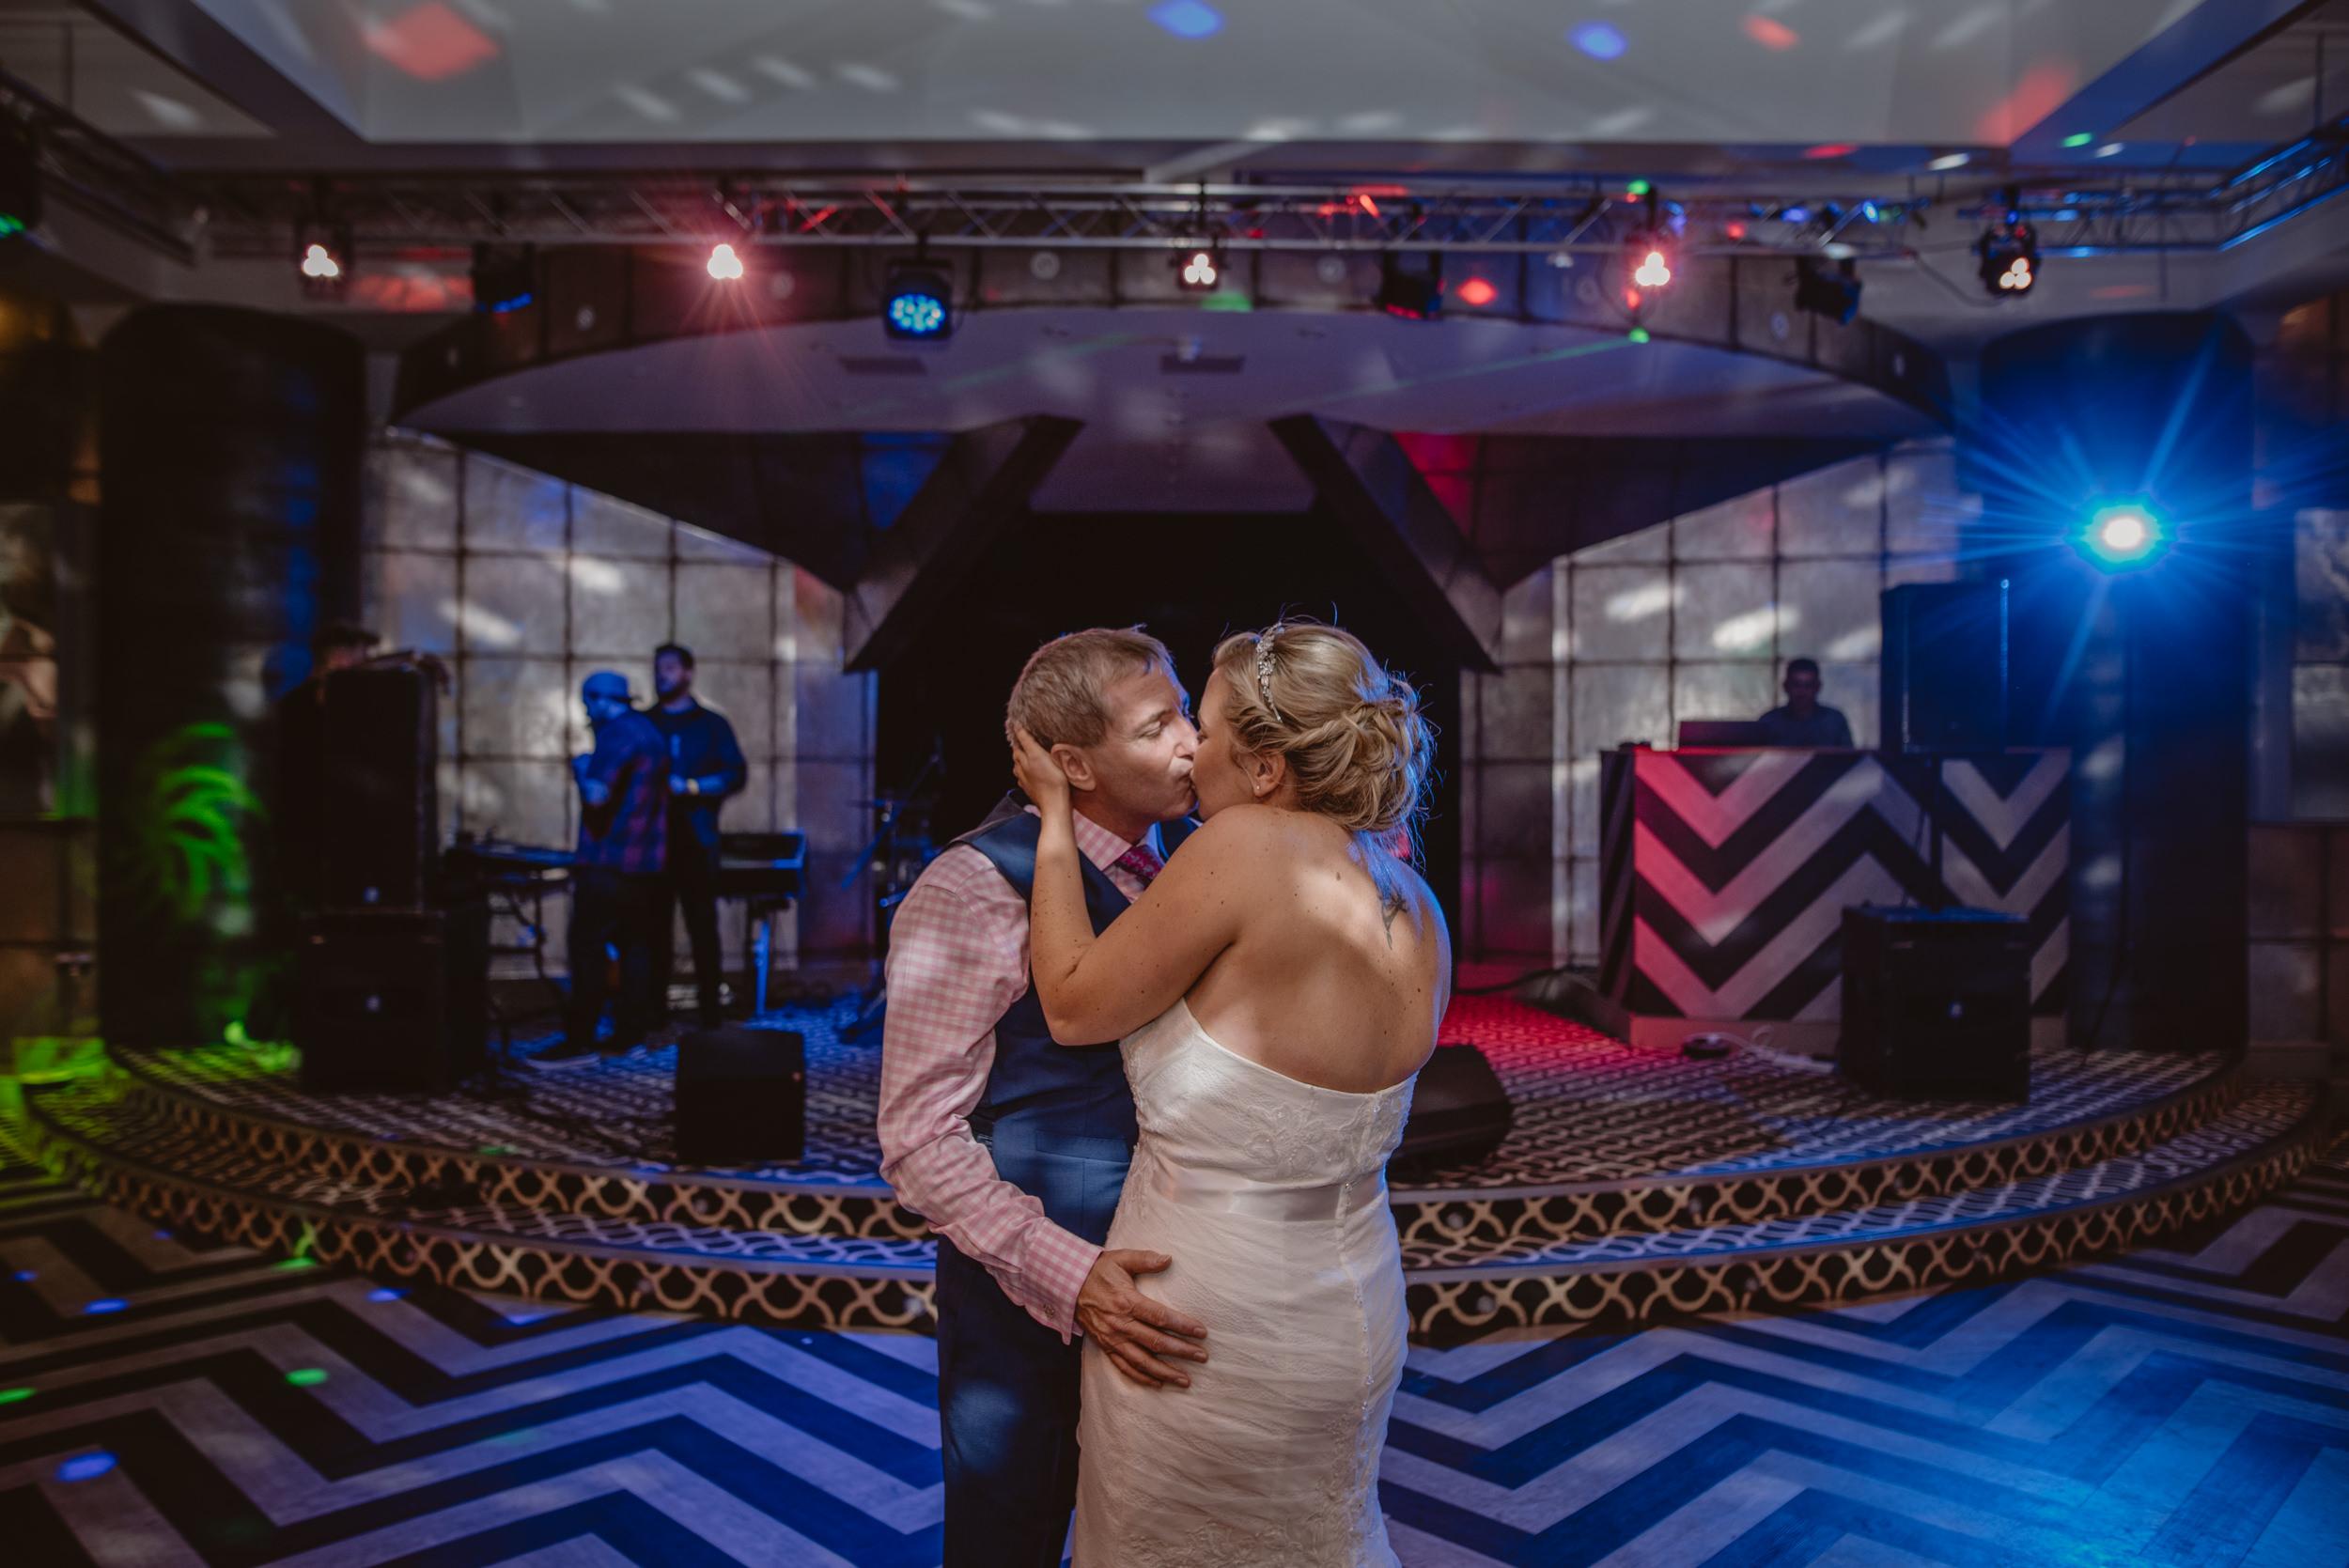 Chantelle-and-Stephen-Old-Thorns-Hotel-Wedding-Liphook-Manu-Mendoza-Wedding-Photography-536.jpg